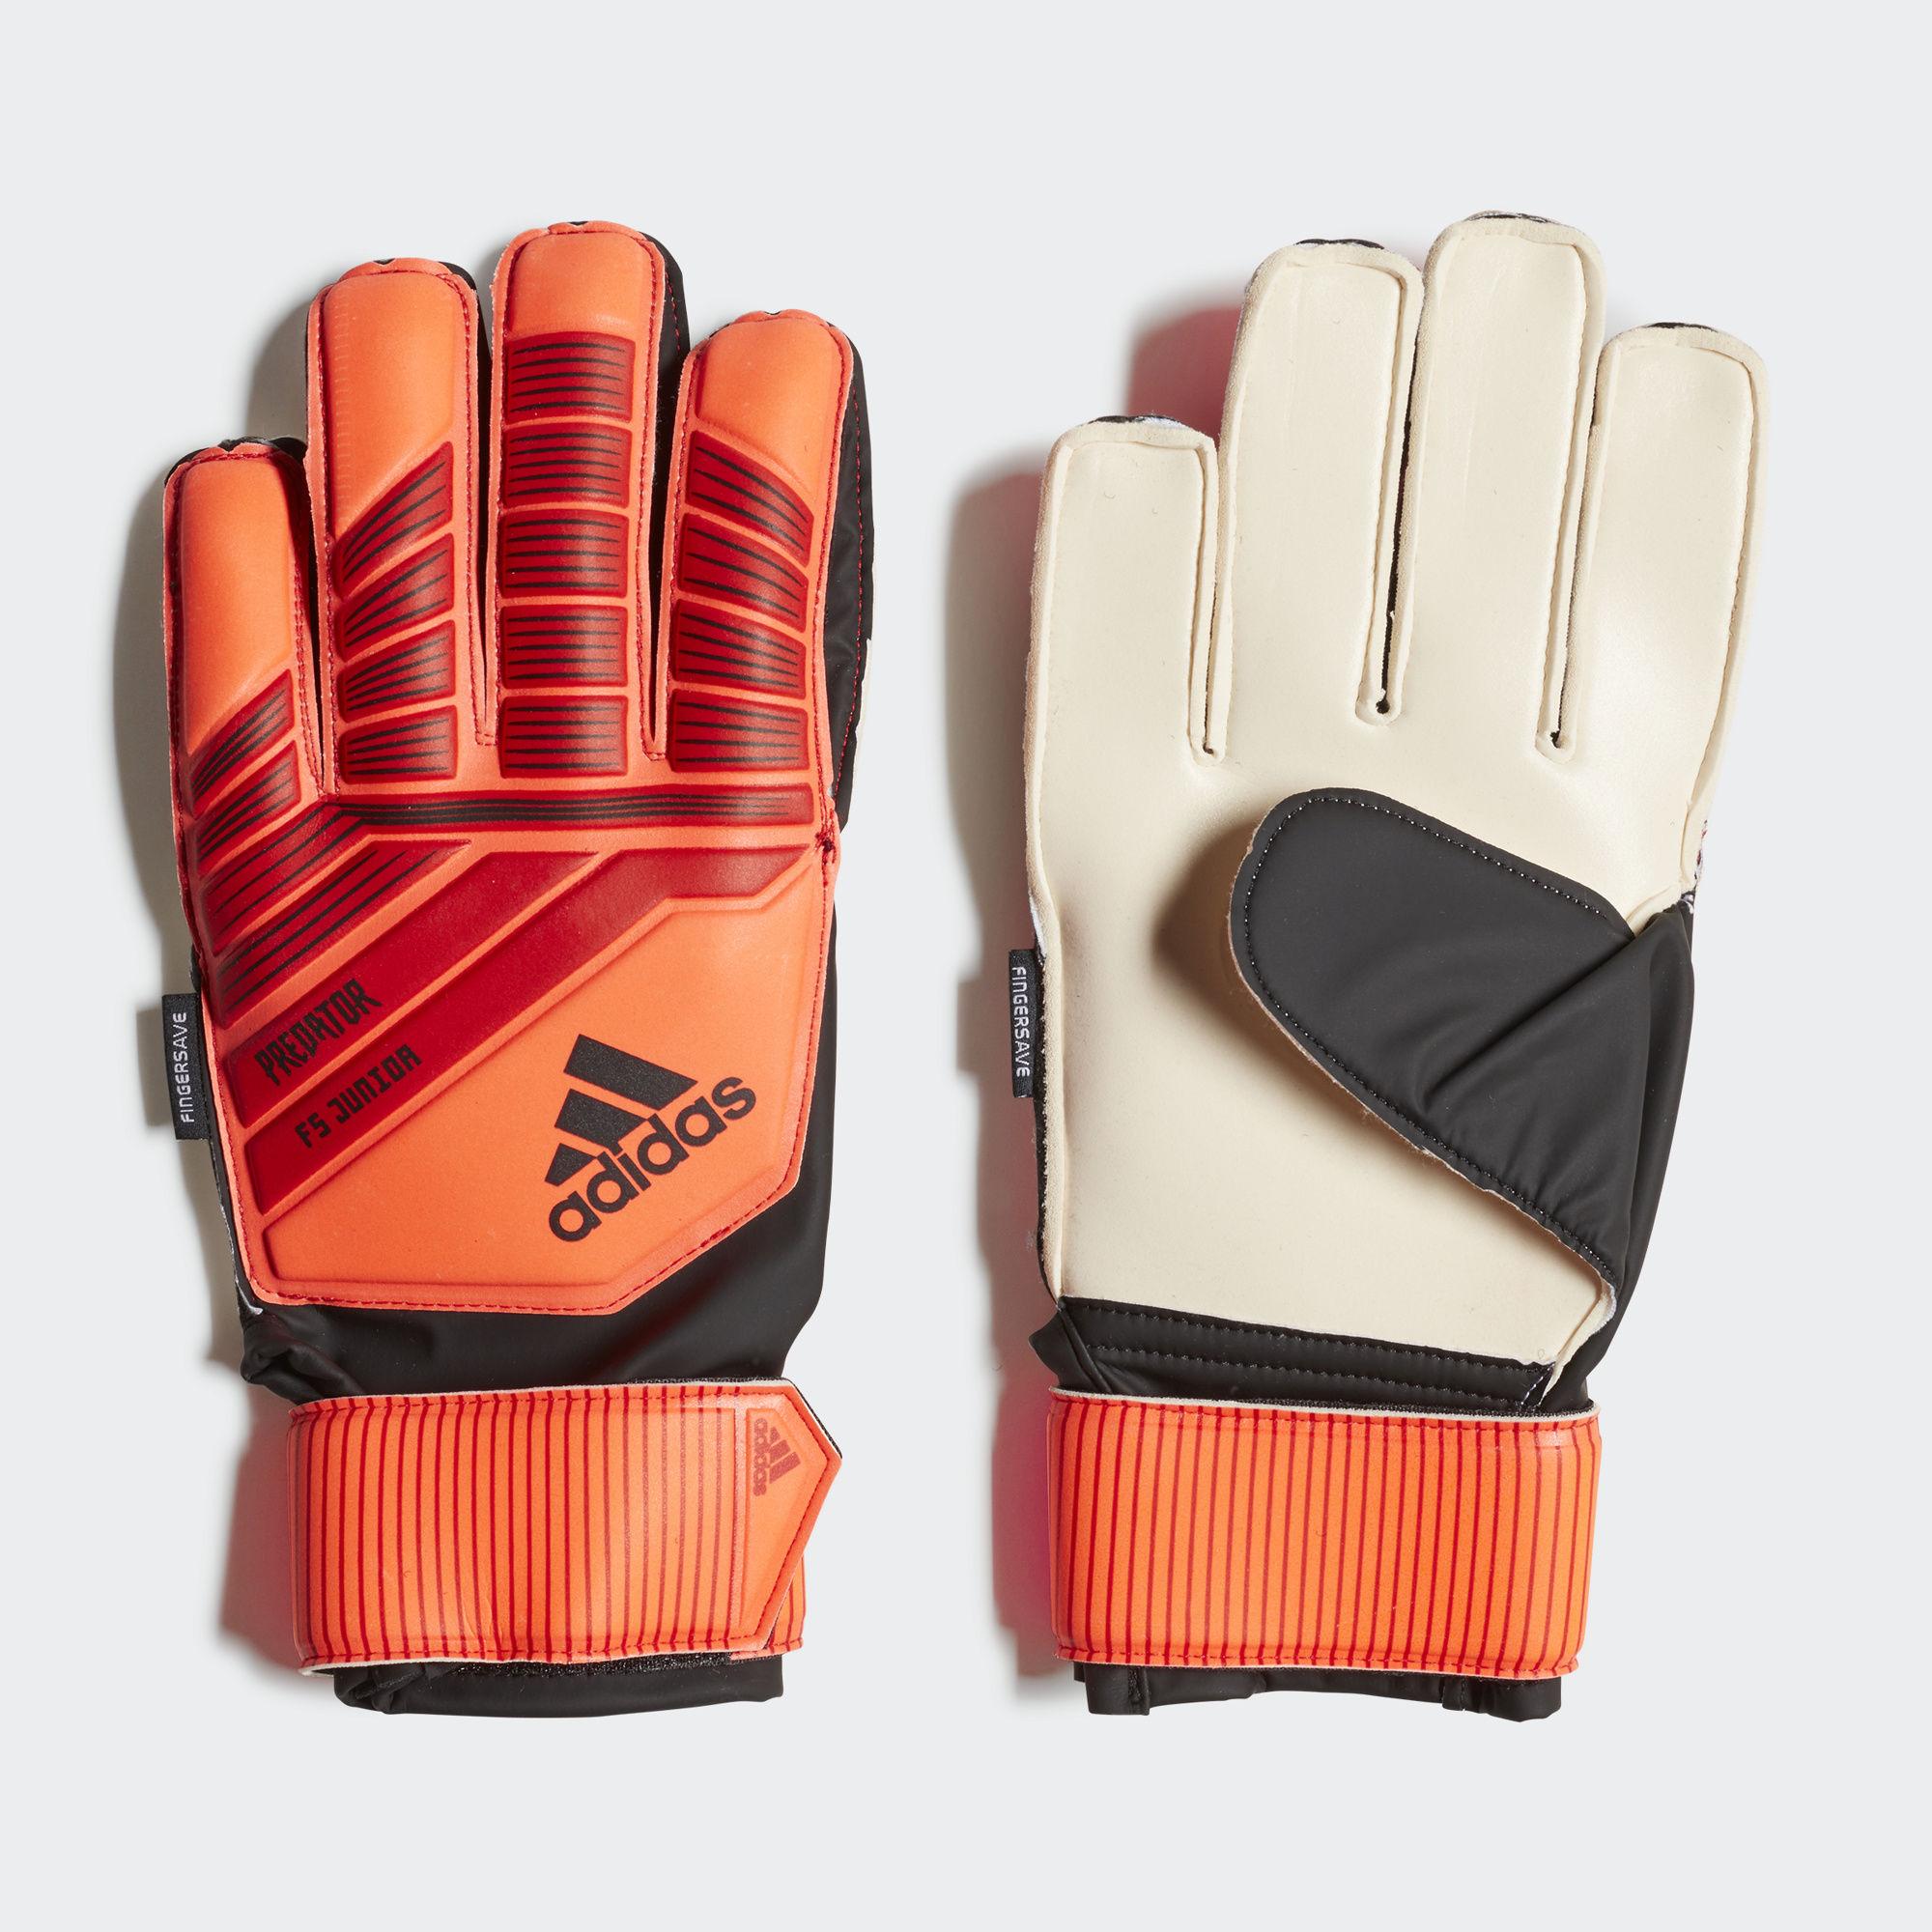 Вратарские перчатки Predator Top Training Fingersave DN8567 adidas  Performance - Украина  9c5921829b86c